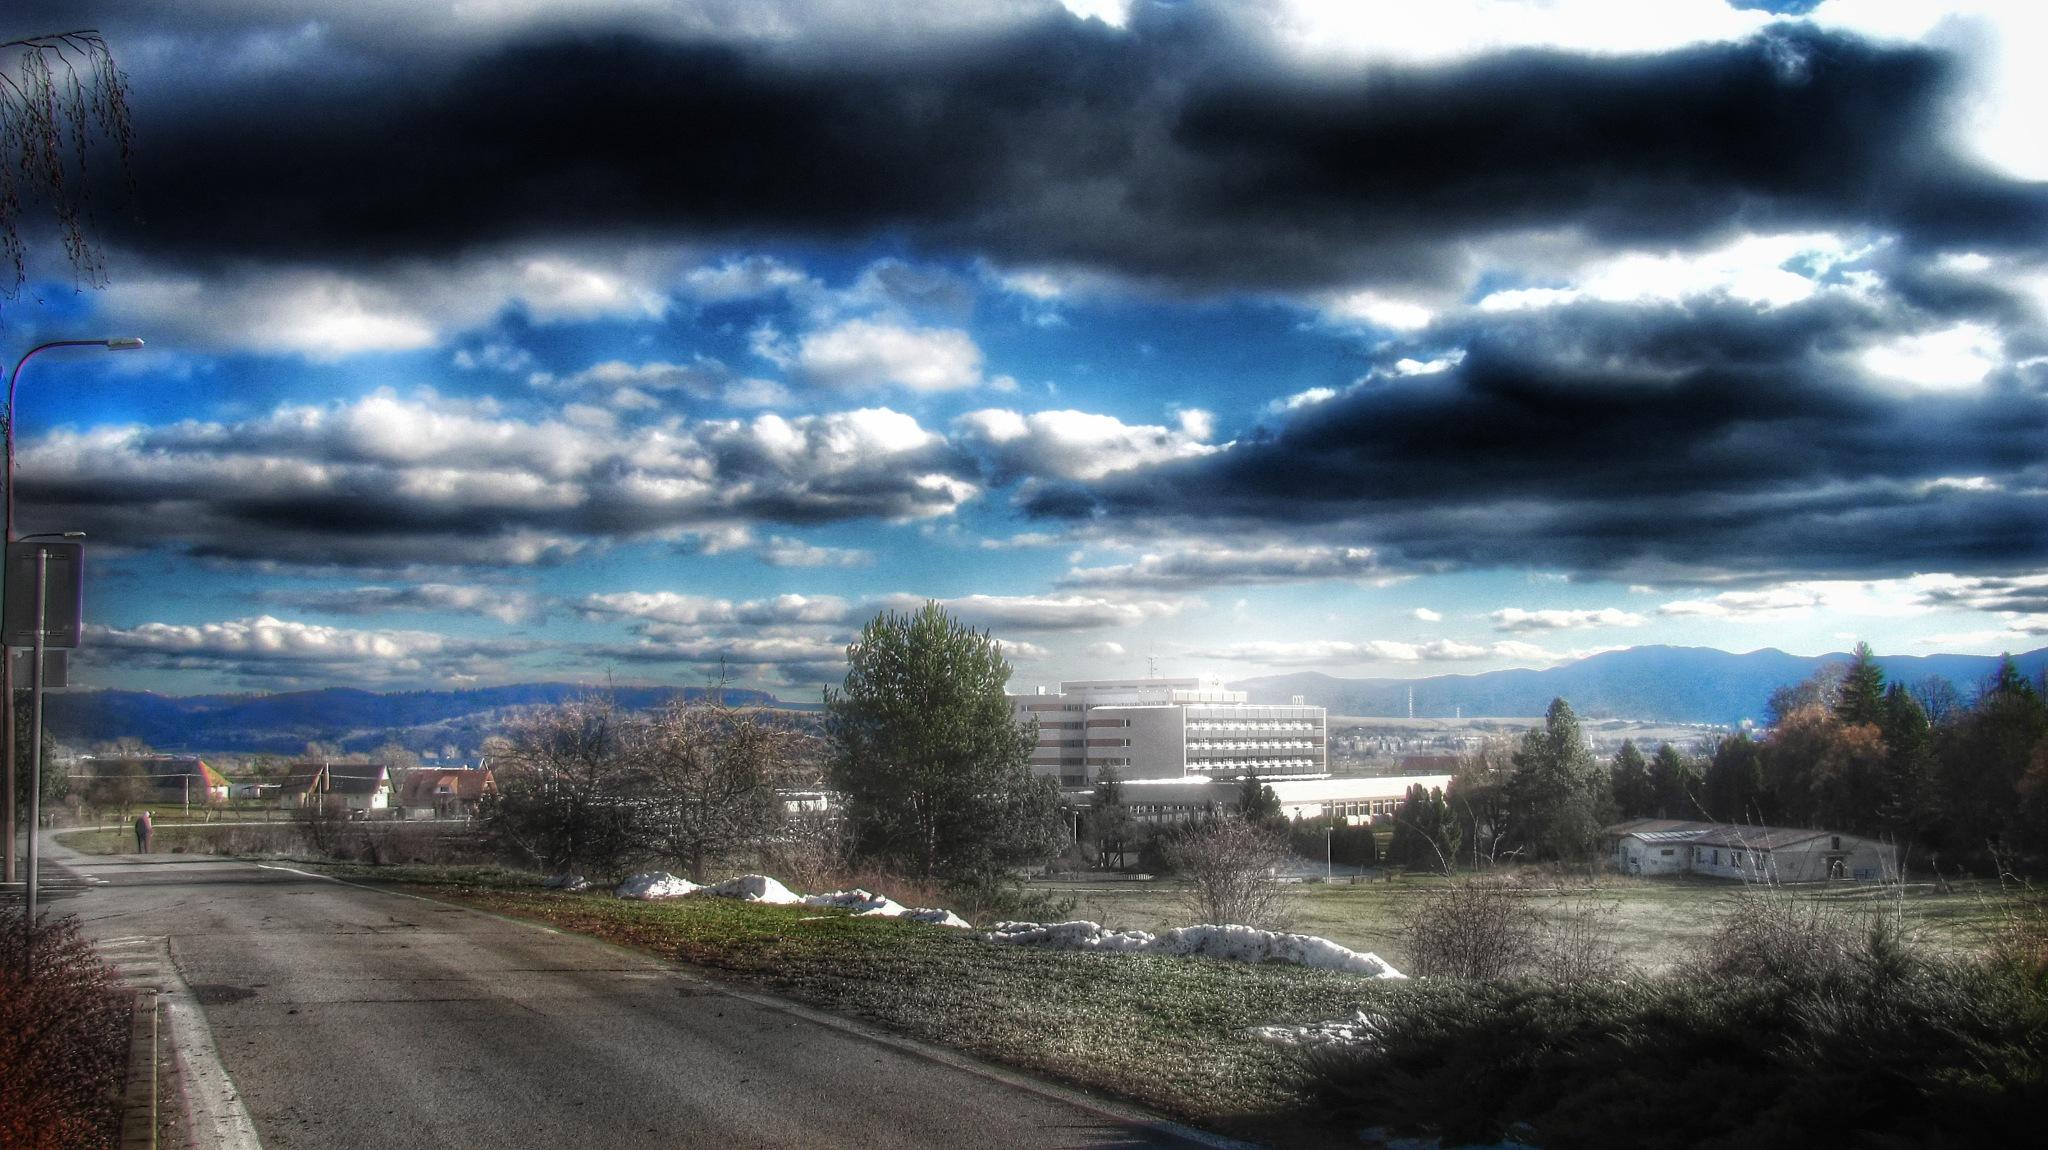 cloudy sky by Michal Dunaj